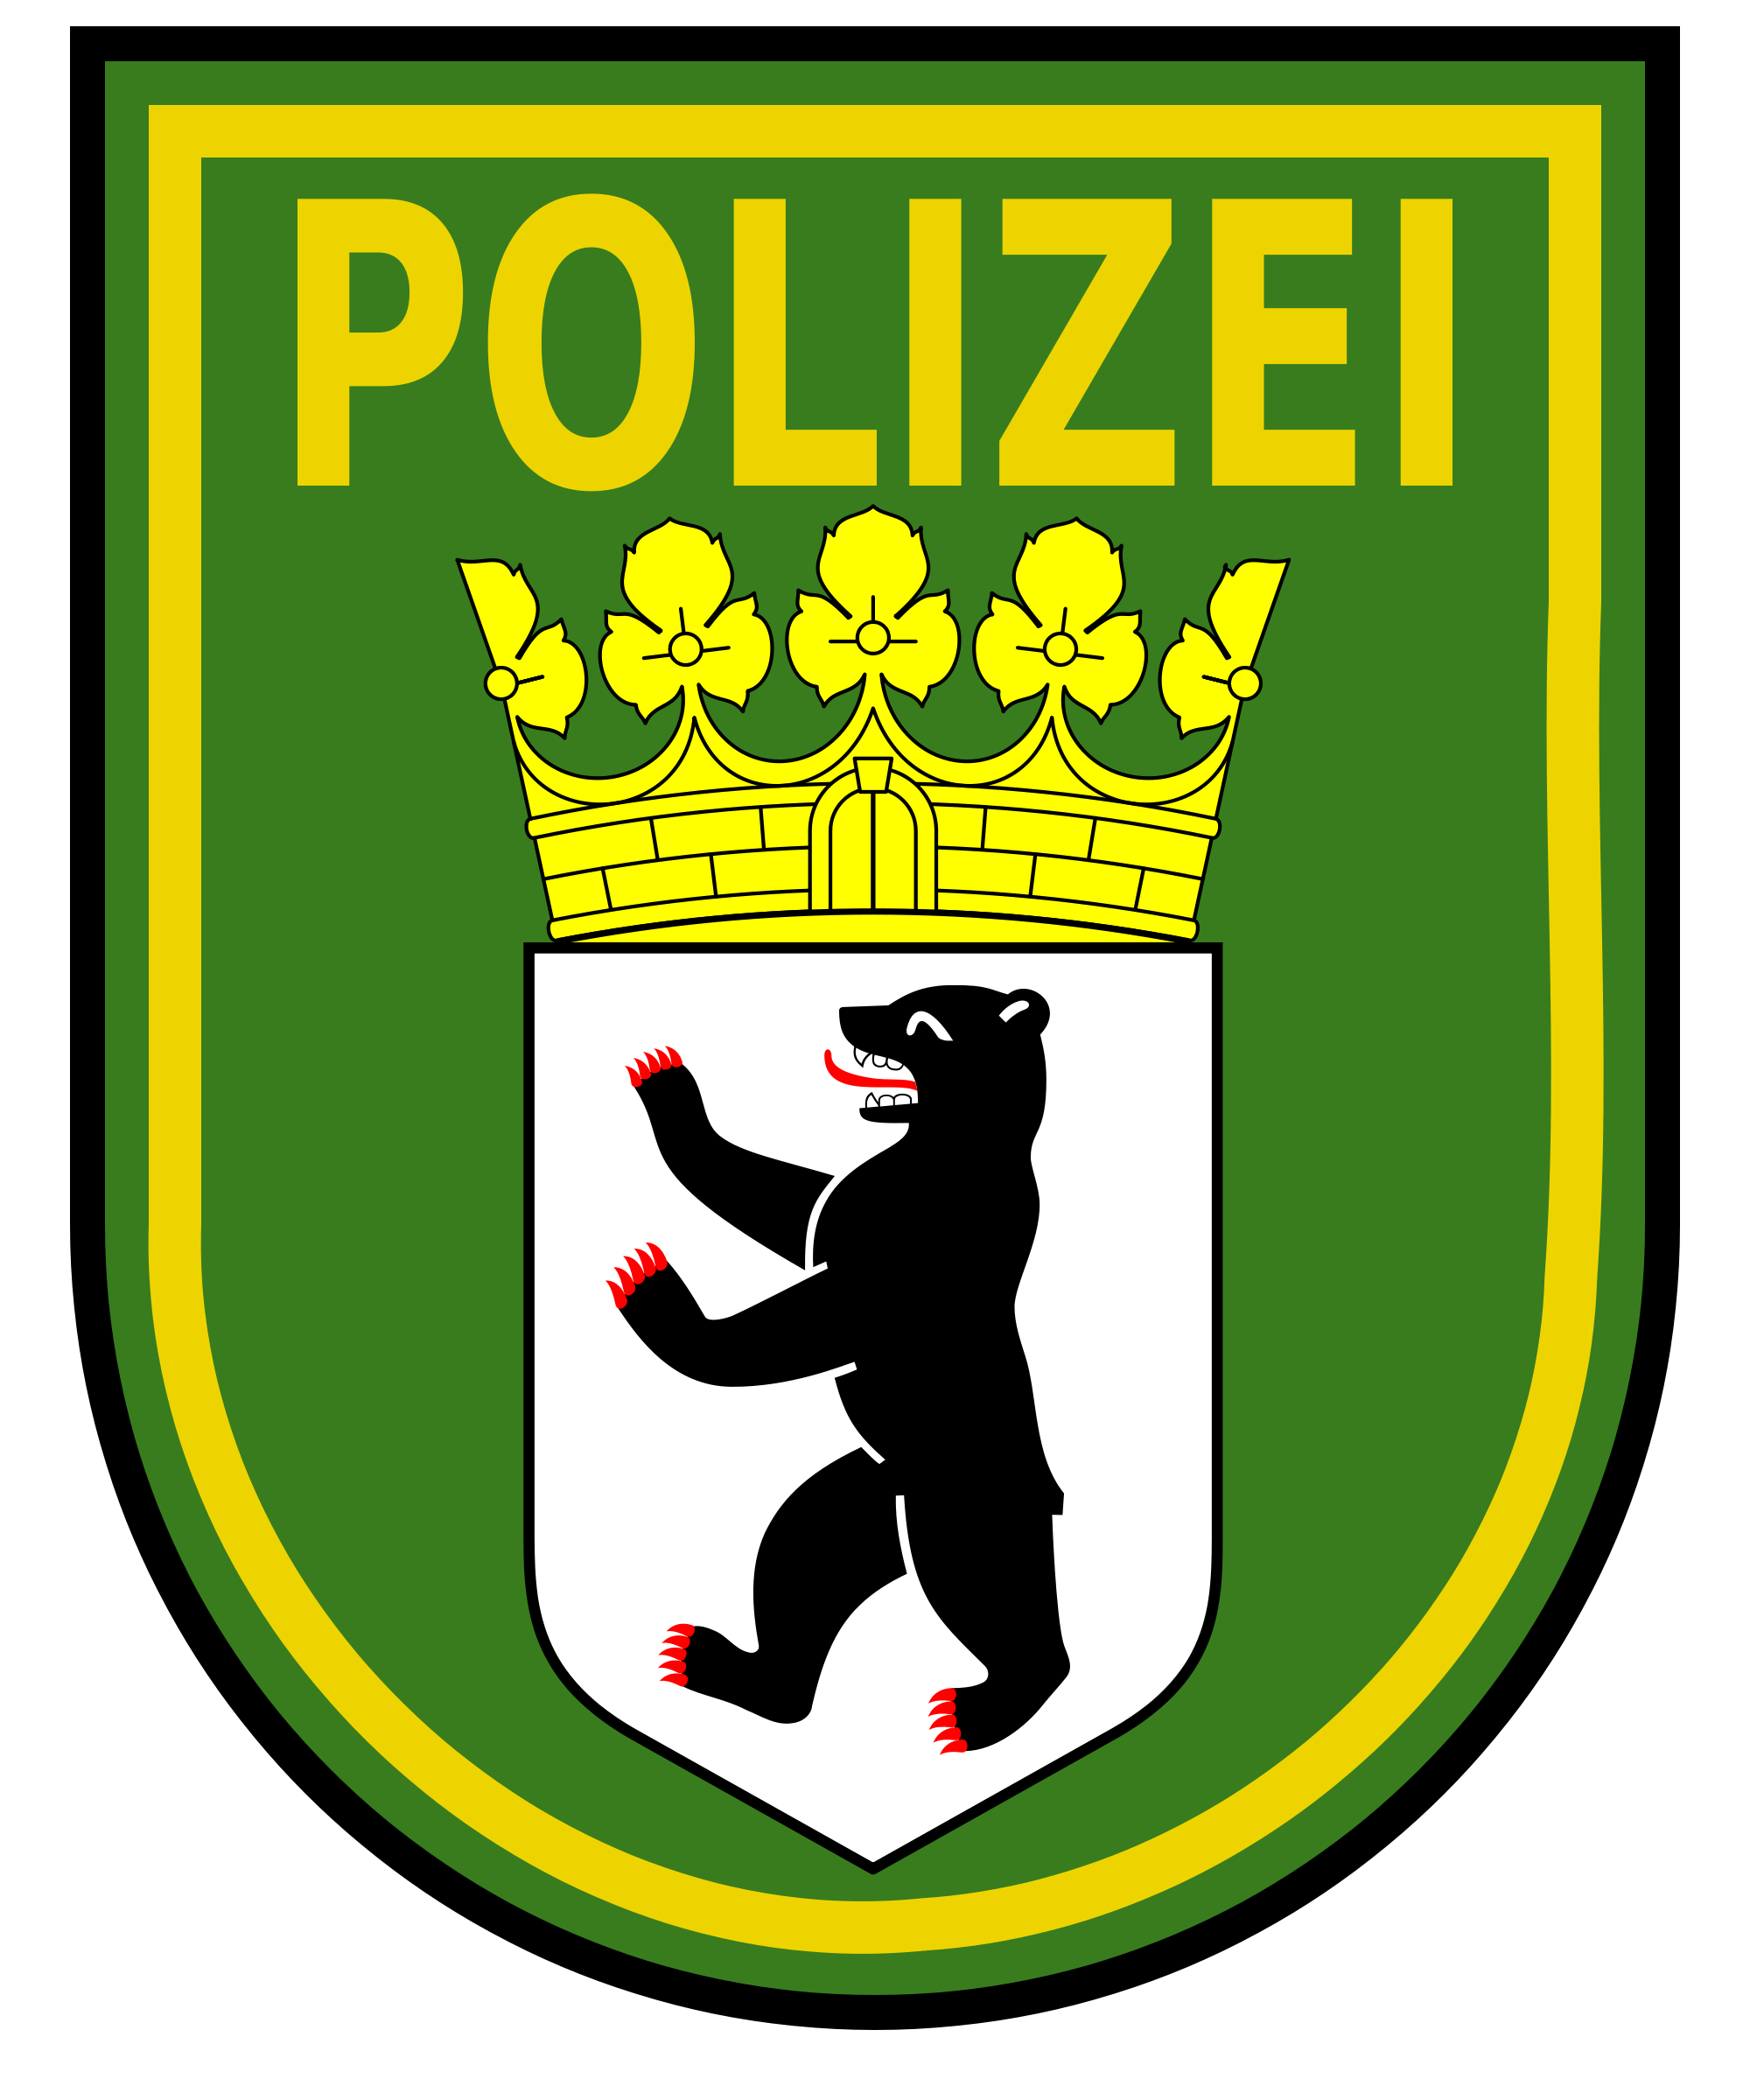 Clipart deutsche polizei clipart library download File:Berlin Police Patch.svg - Wikimedia Commons clipart library download